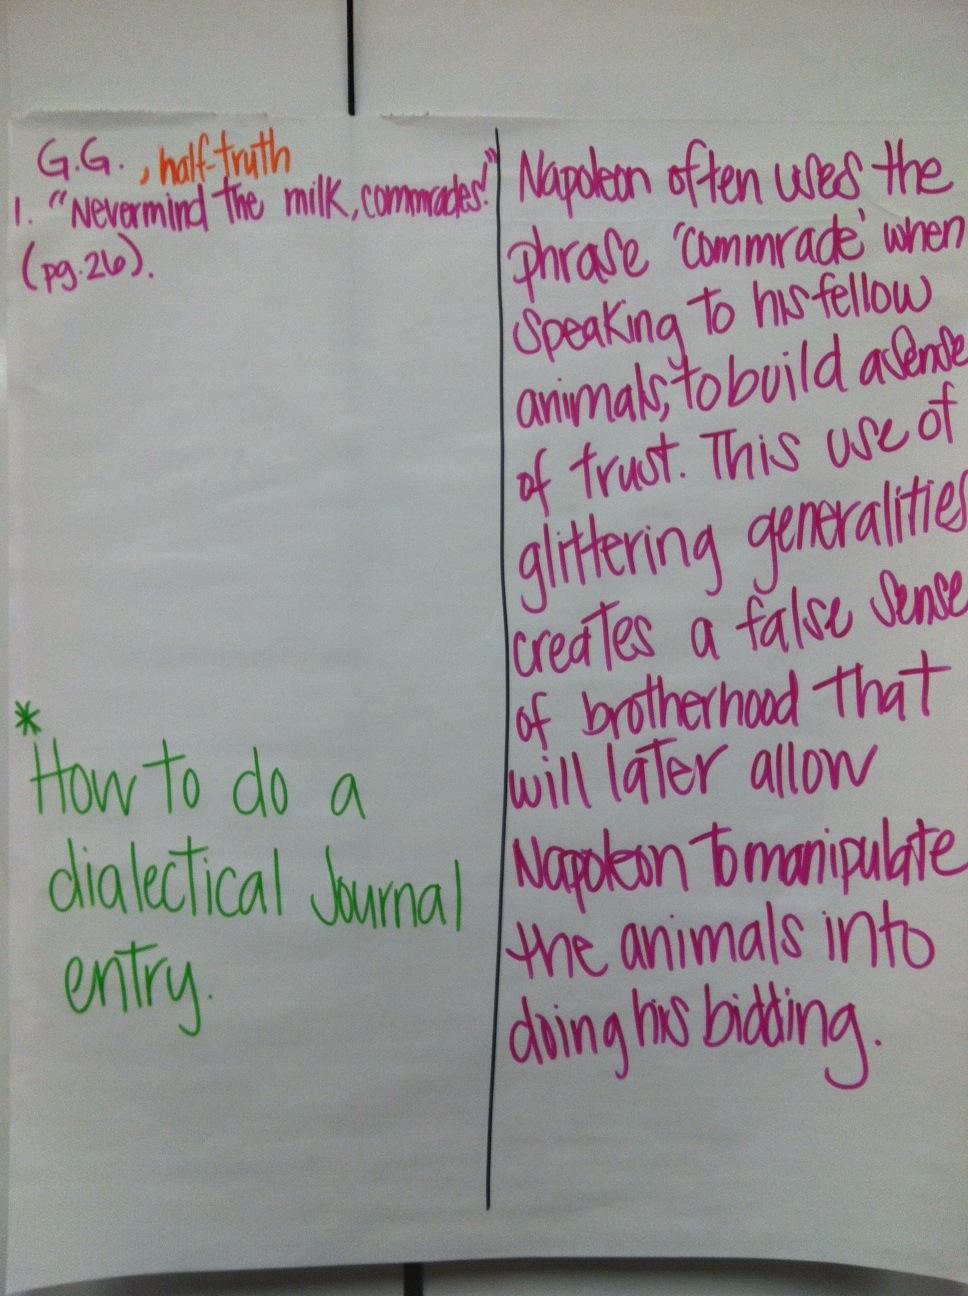 animal farm dialectic journal essay